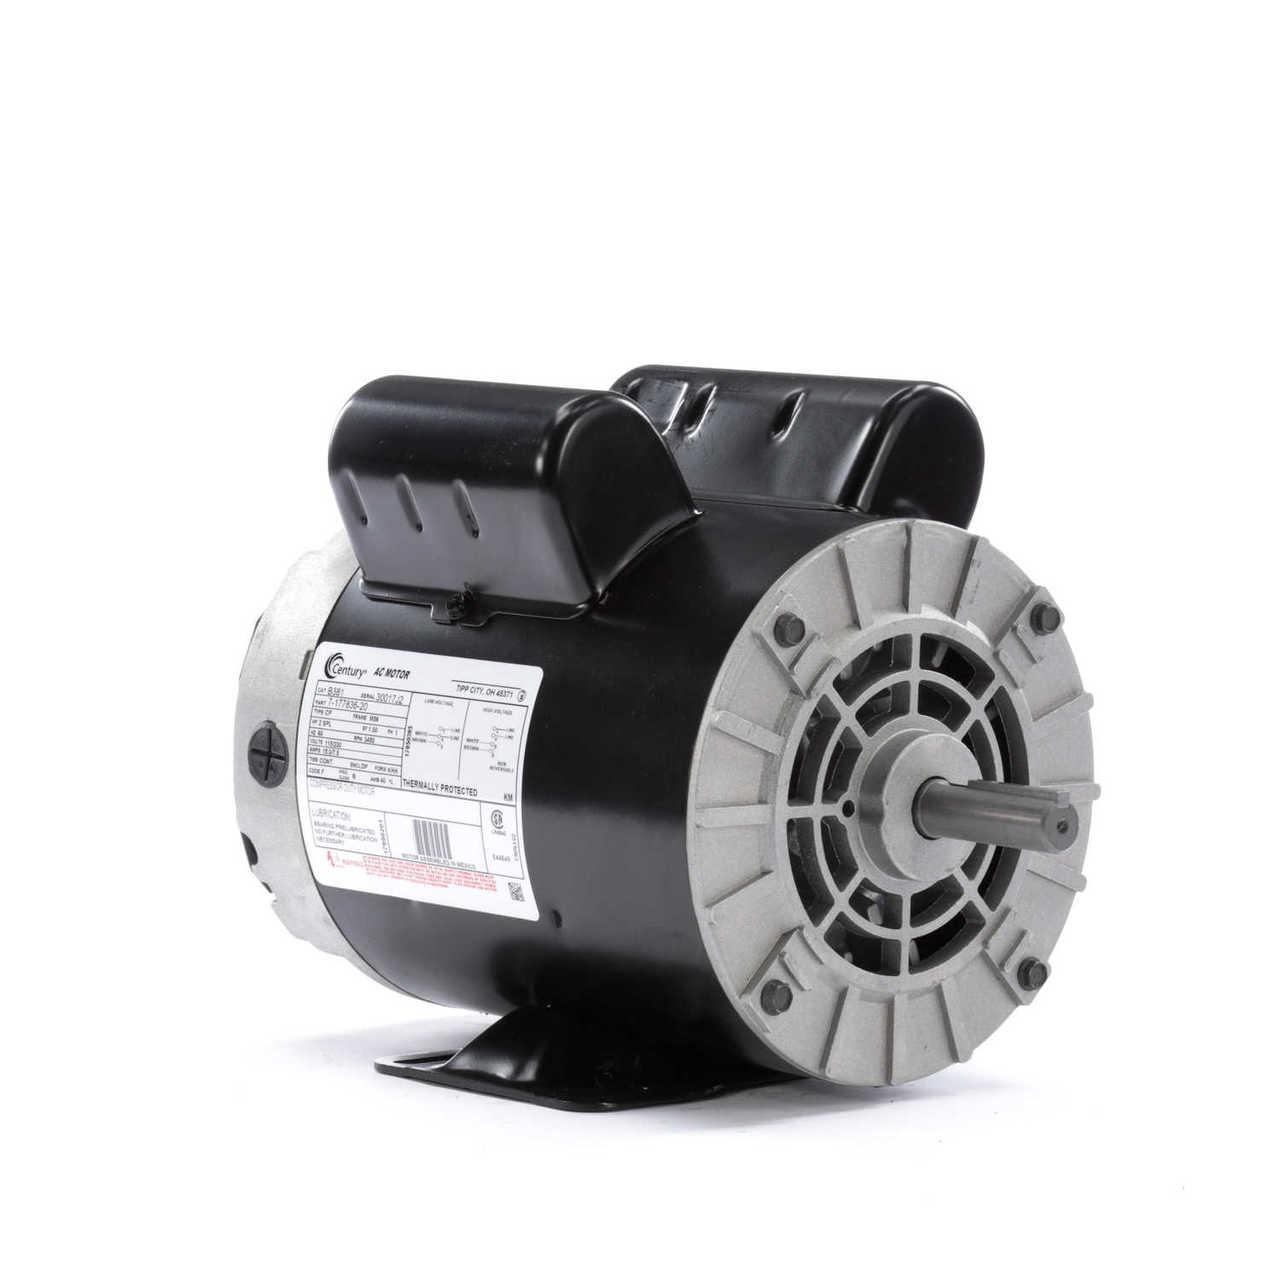 2 HP SPL 3450 RPM M56 Frame 115/230V Air Compressor Motor - Century J Century Motor Wiring Schematic on